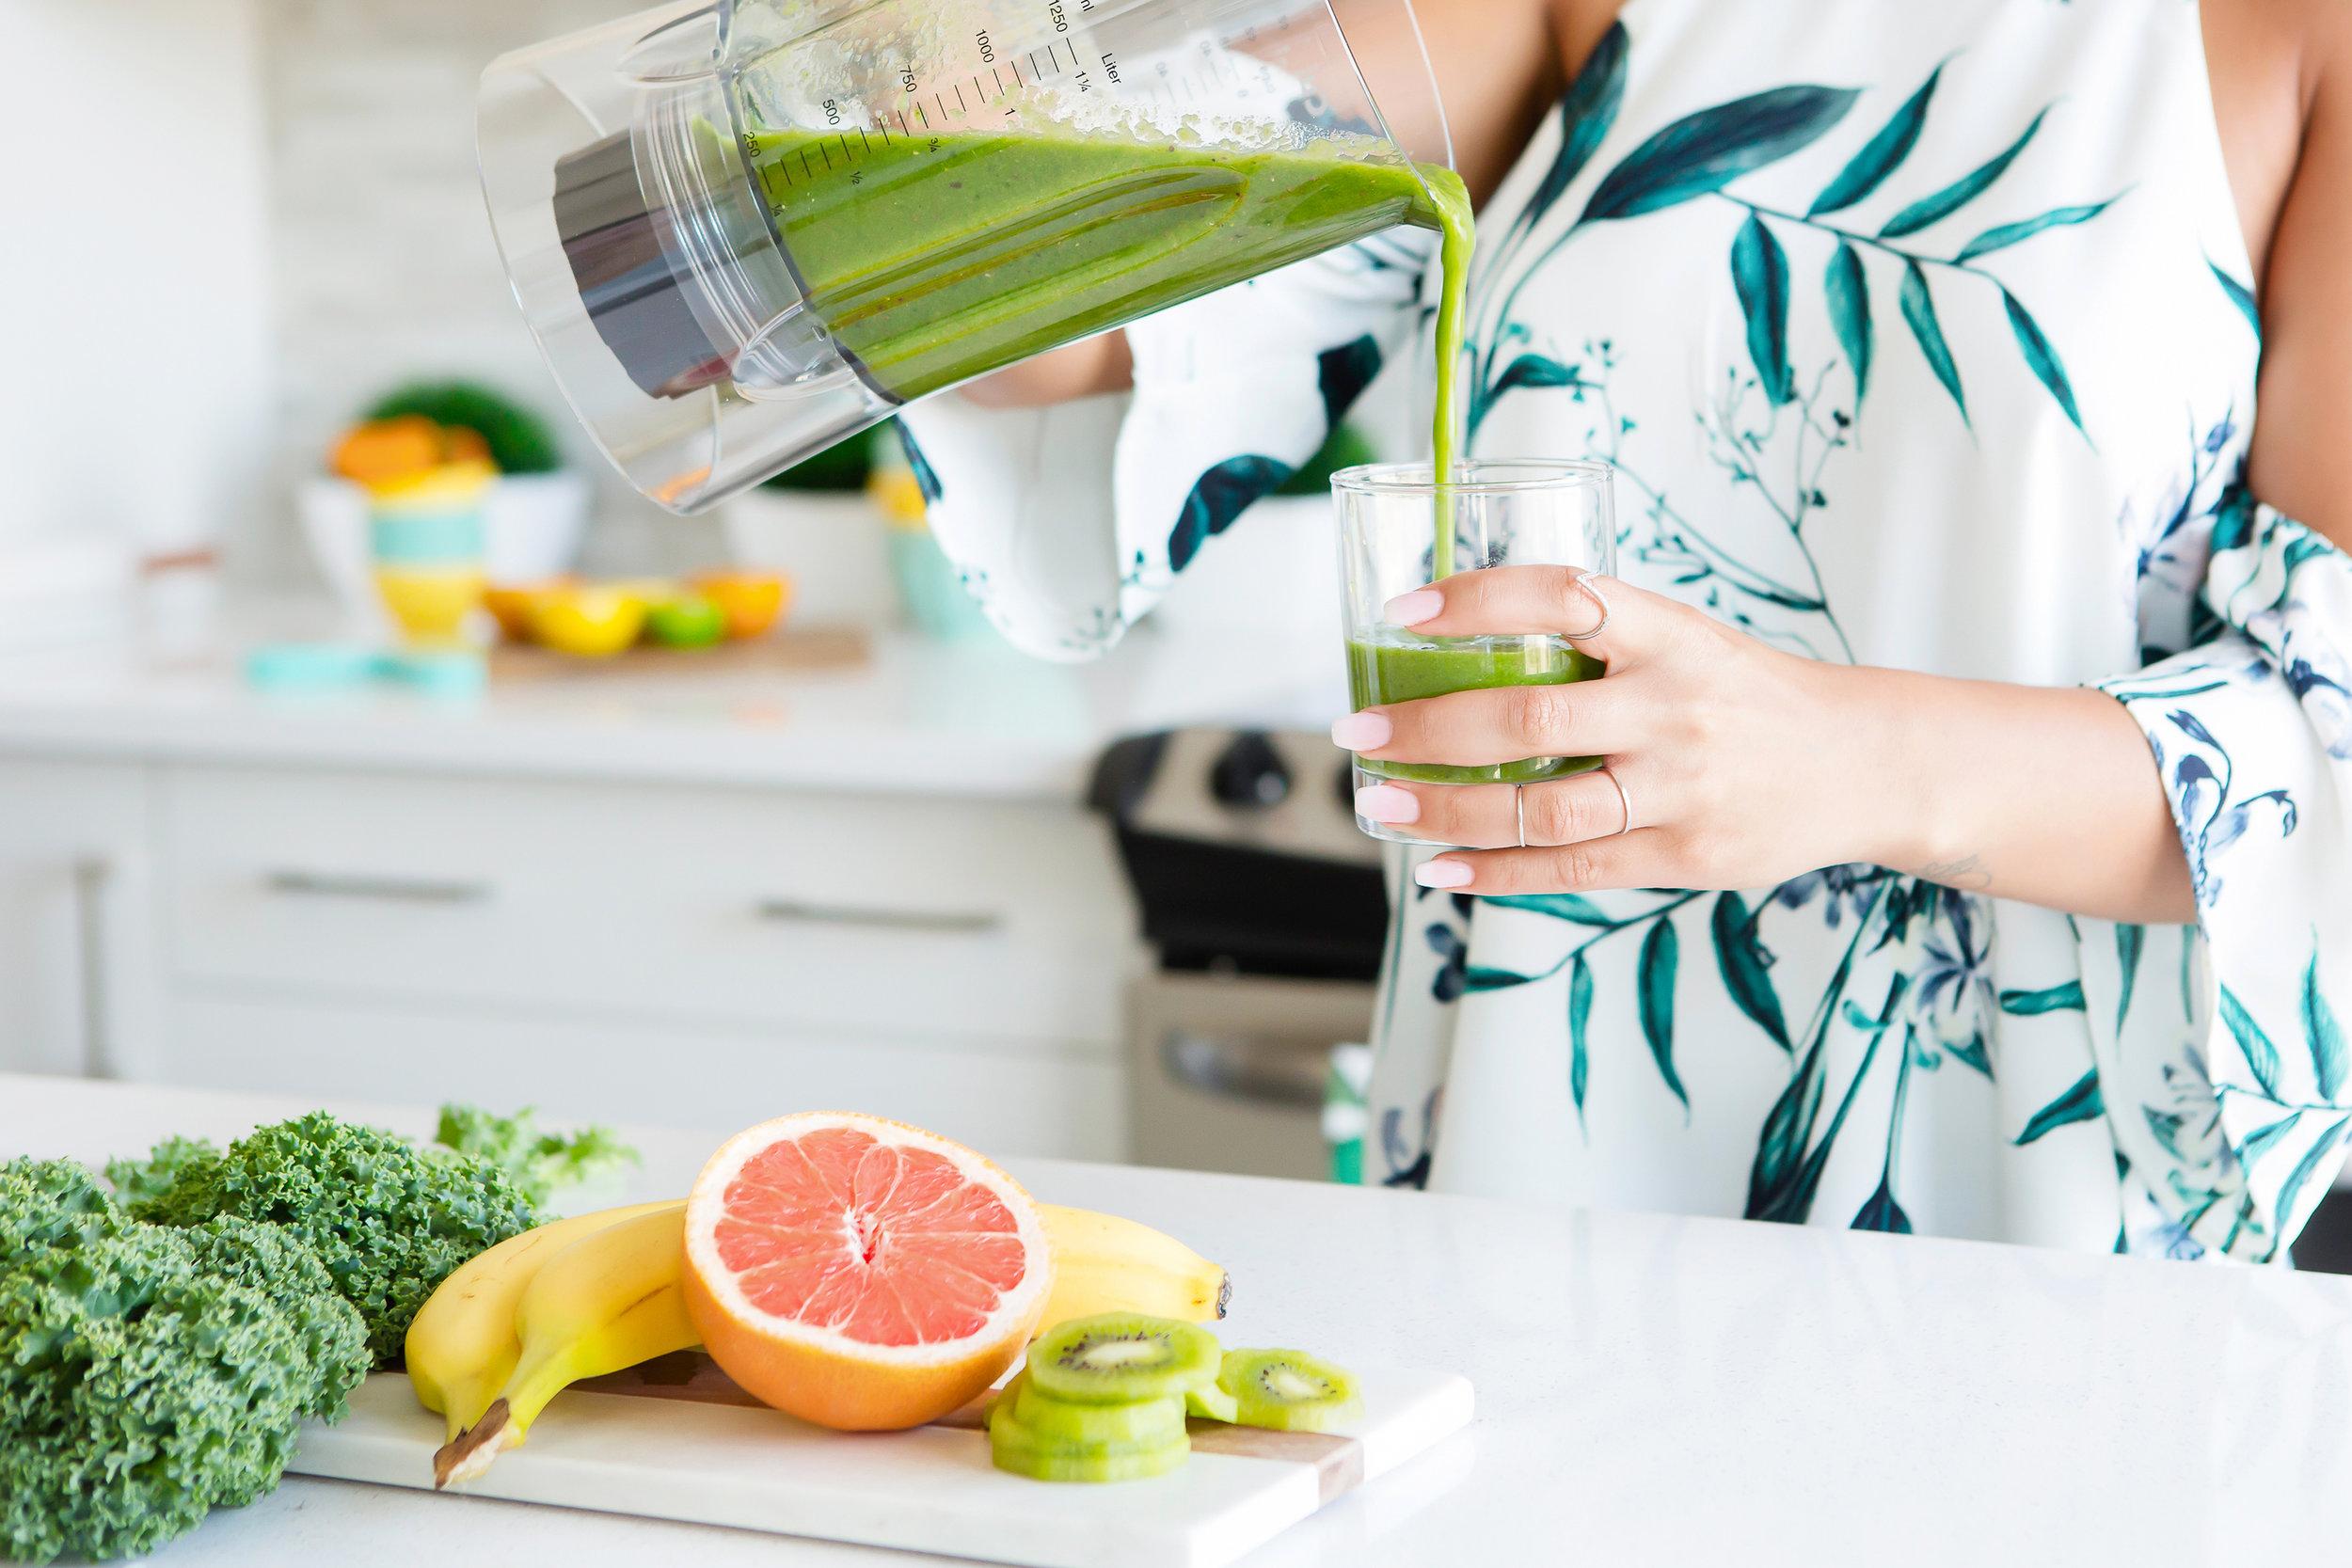 haute-stock-photography-healthy-food-nutrition-final-25.jpg